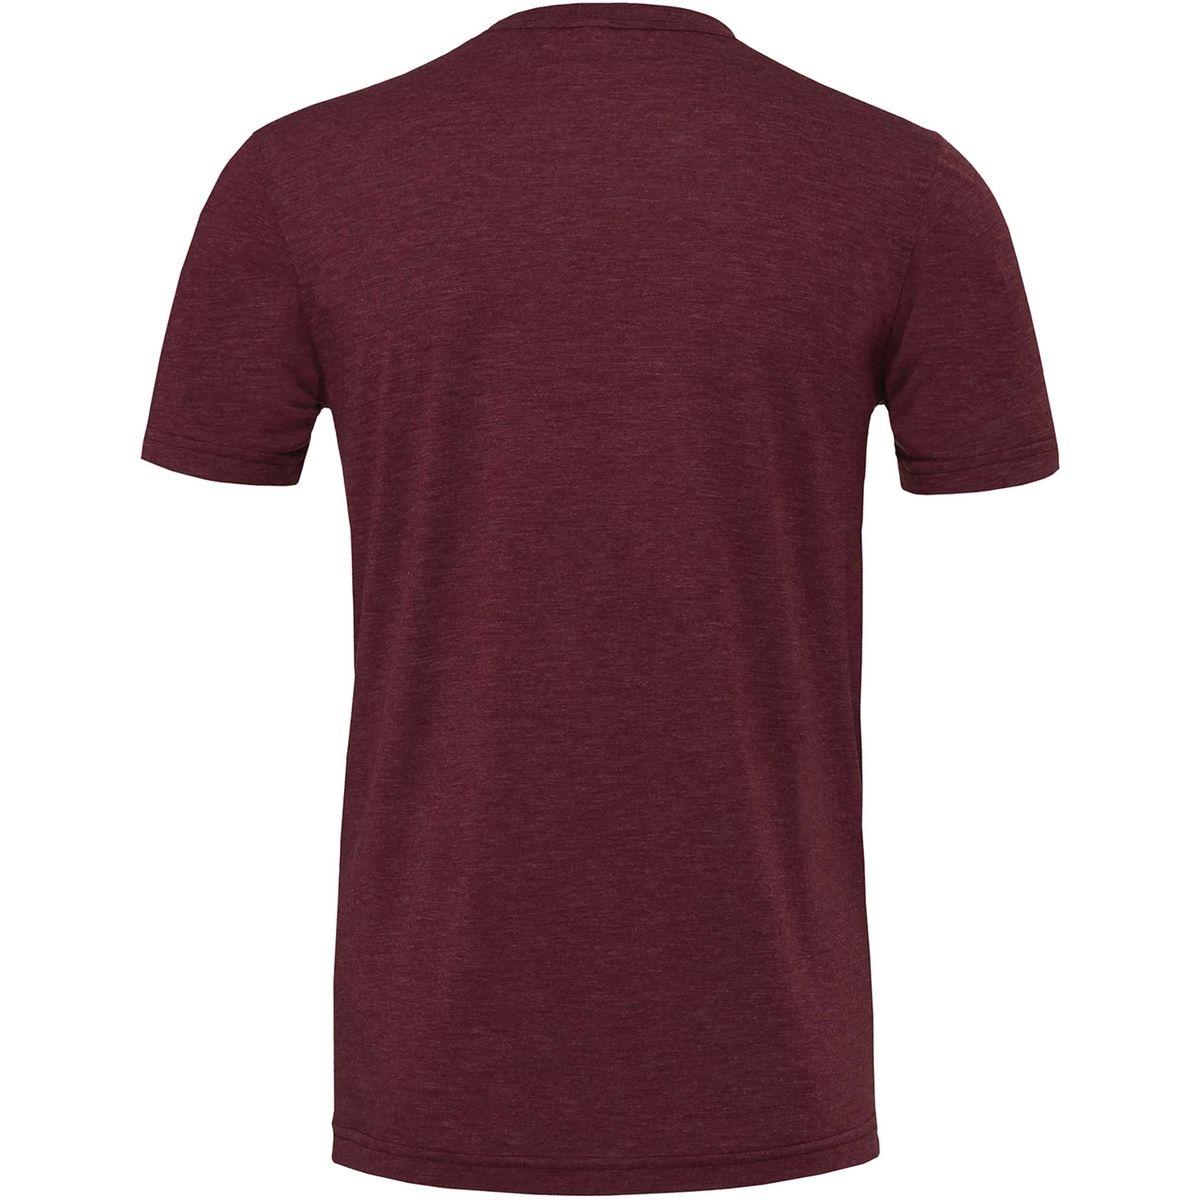 T-shirt manches courtes col rond chiné